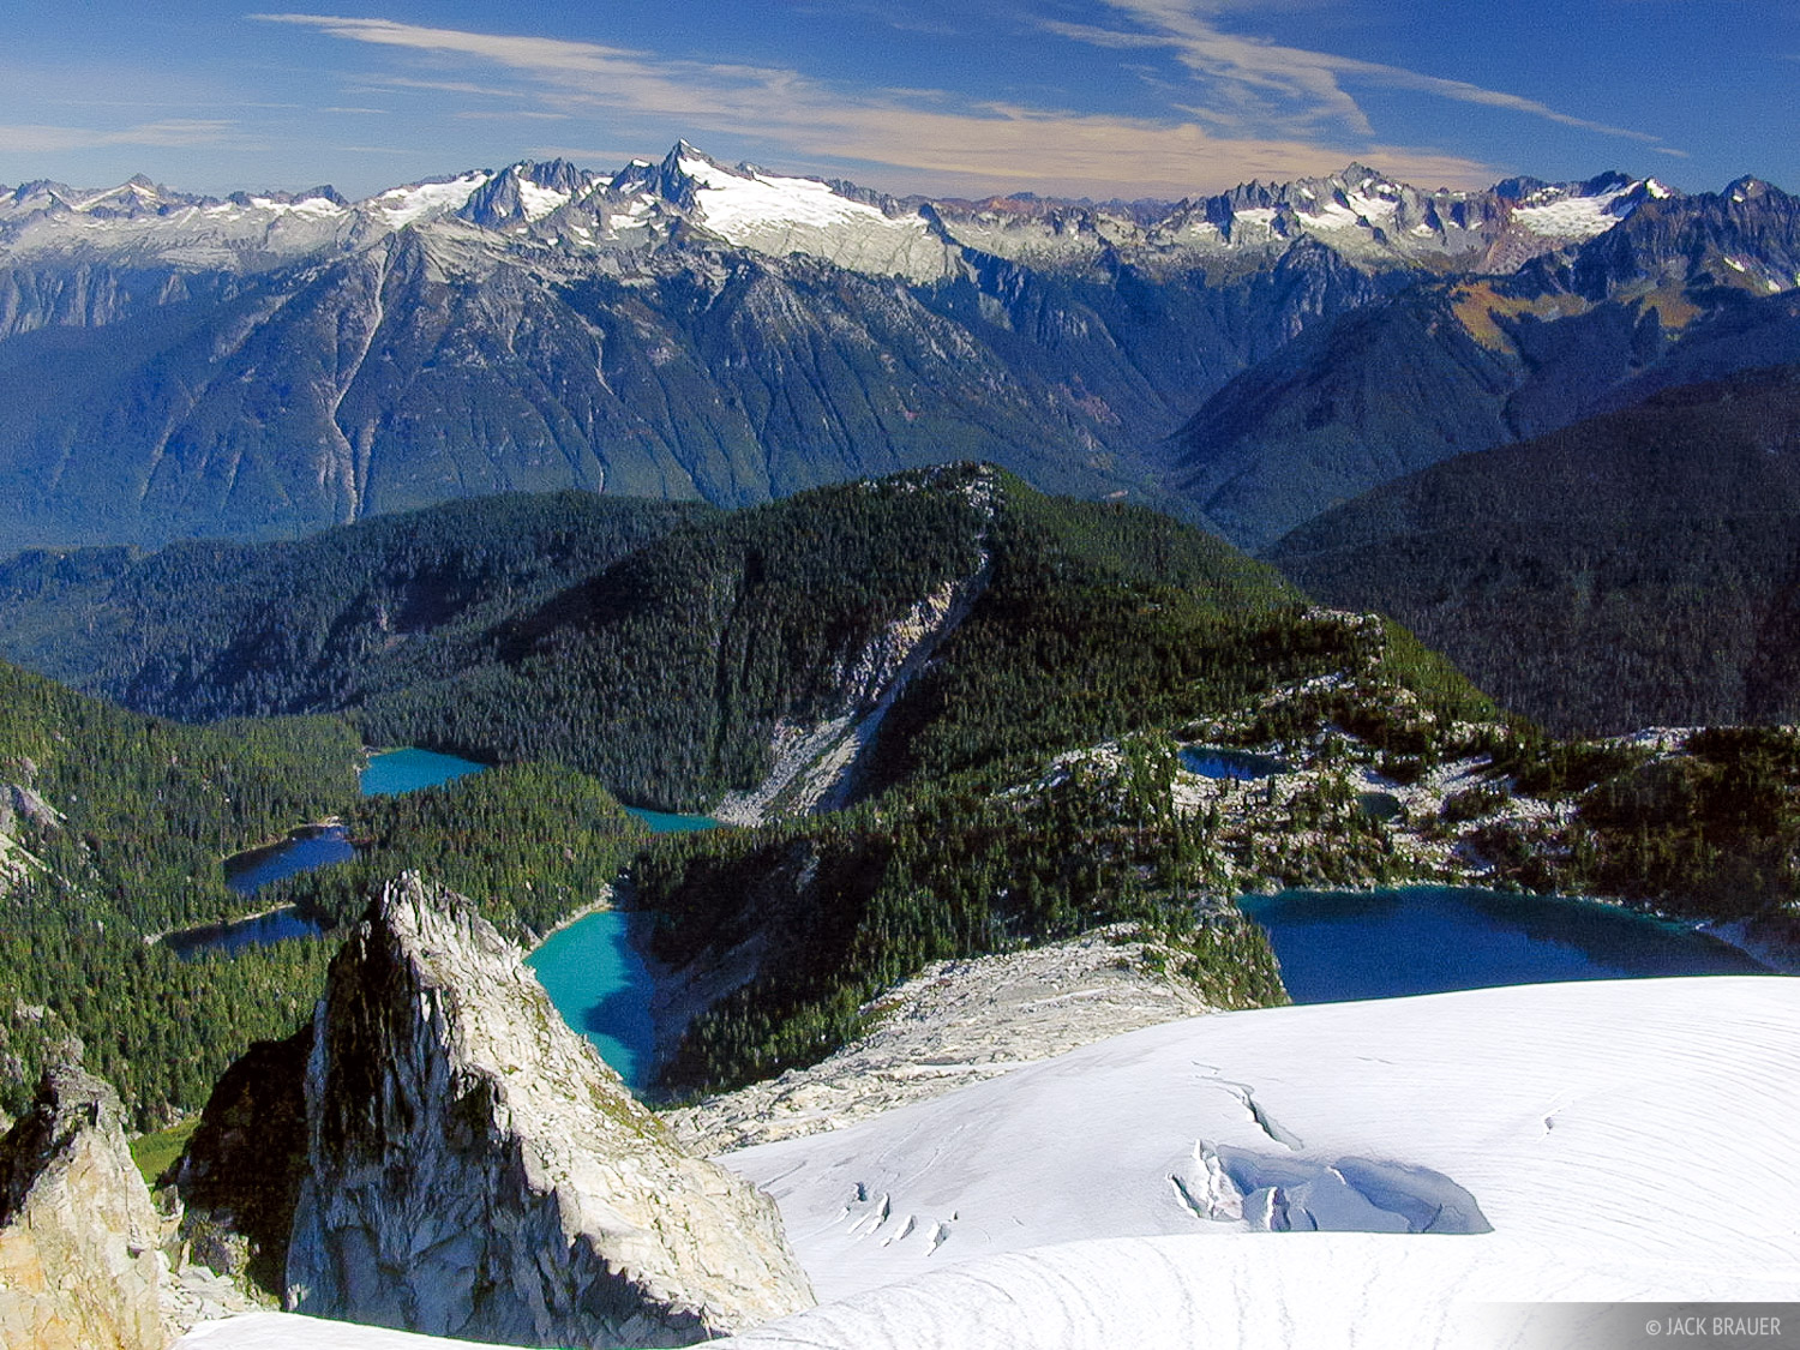 alpine lakes below Snowking Mtn. - Eldorado Peak and the  North Cascades National Park in the distance - September